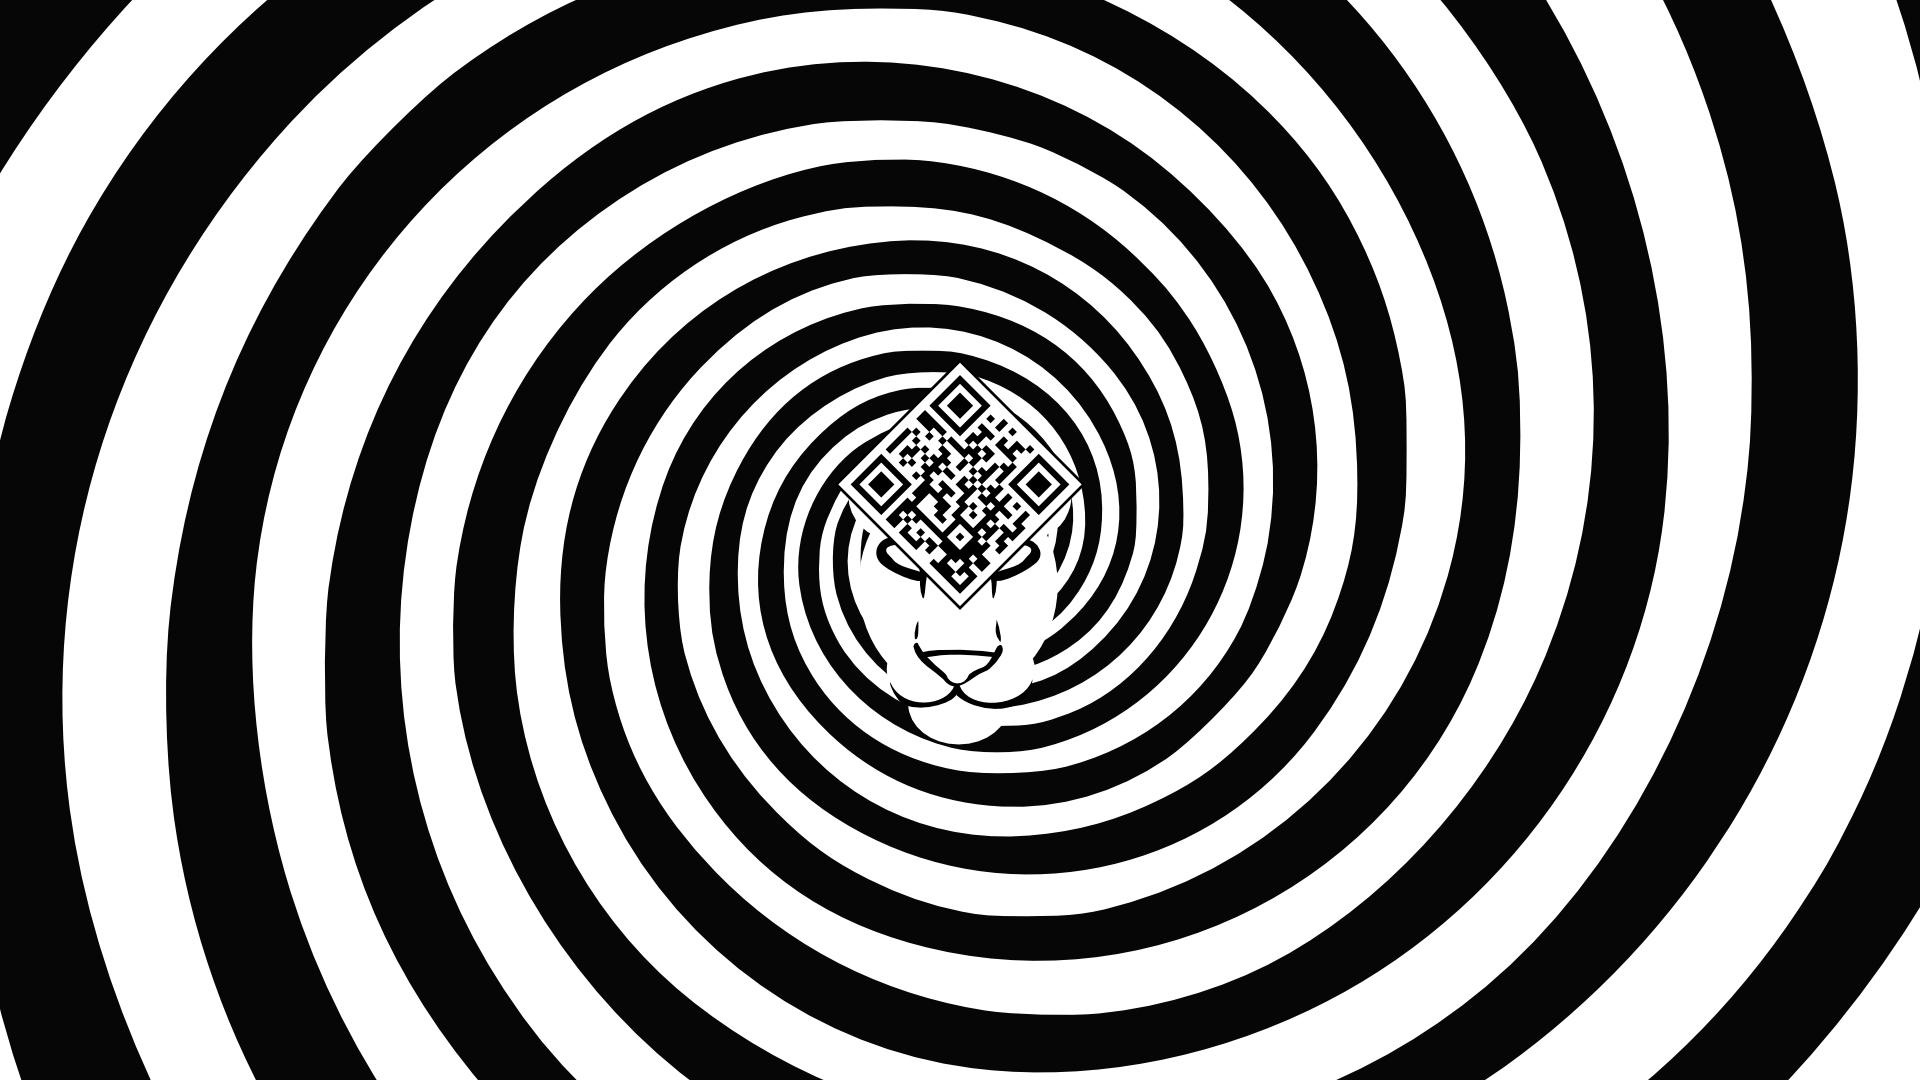 hypnosis moving wallpaper hypnotic - photo #31